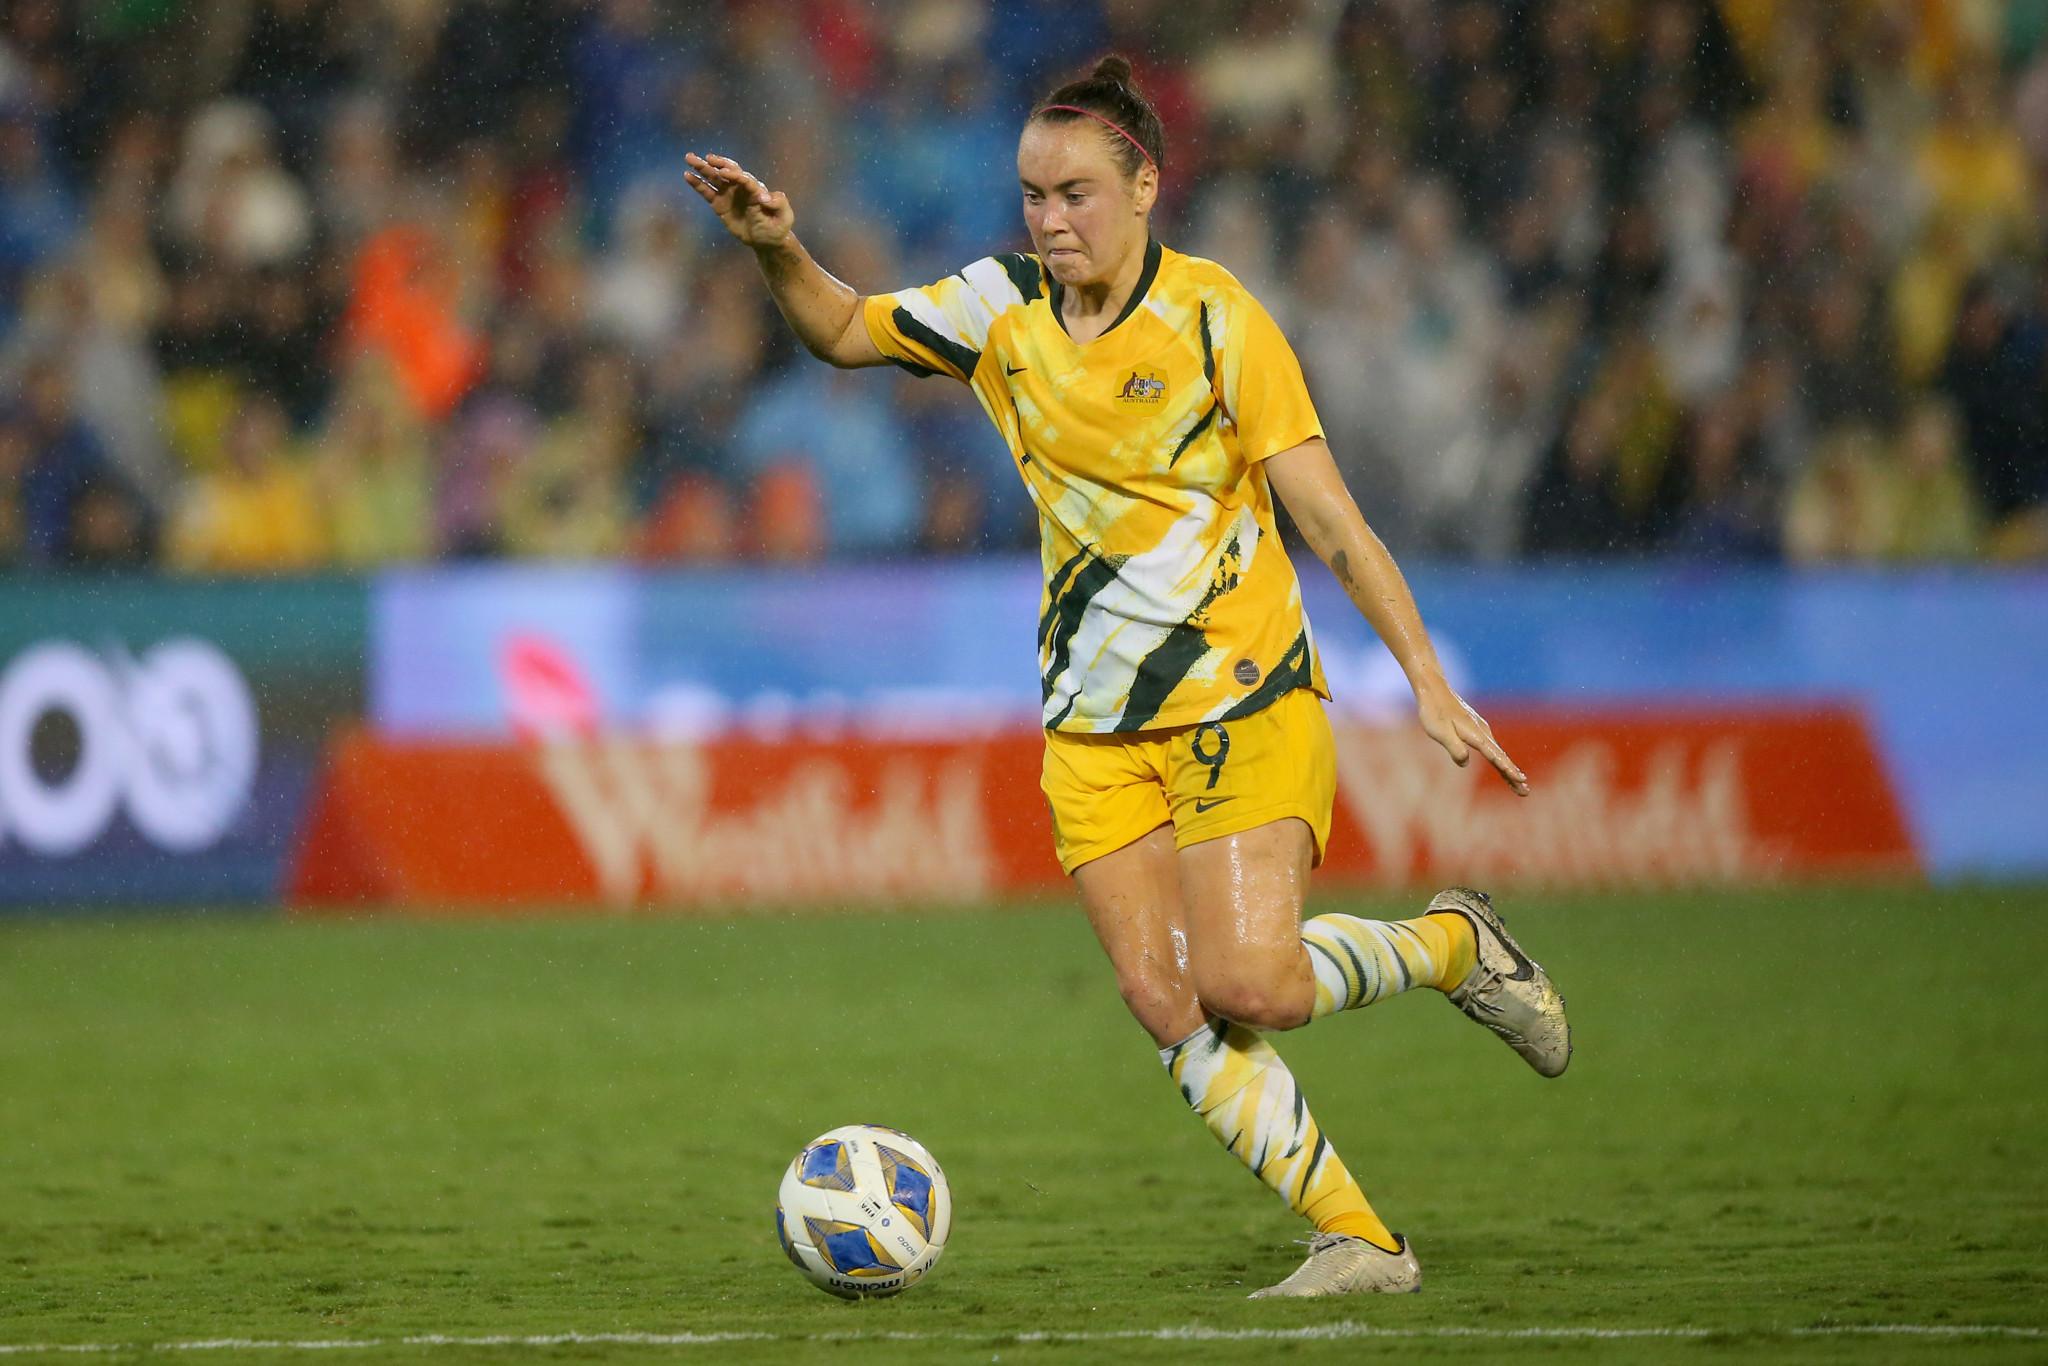 Funding confirmed for Australian women's football team training facility